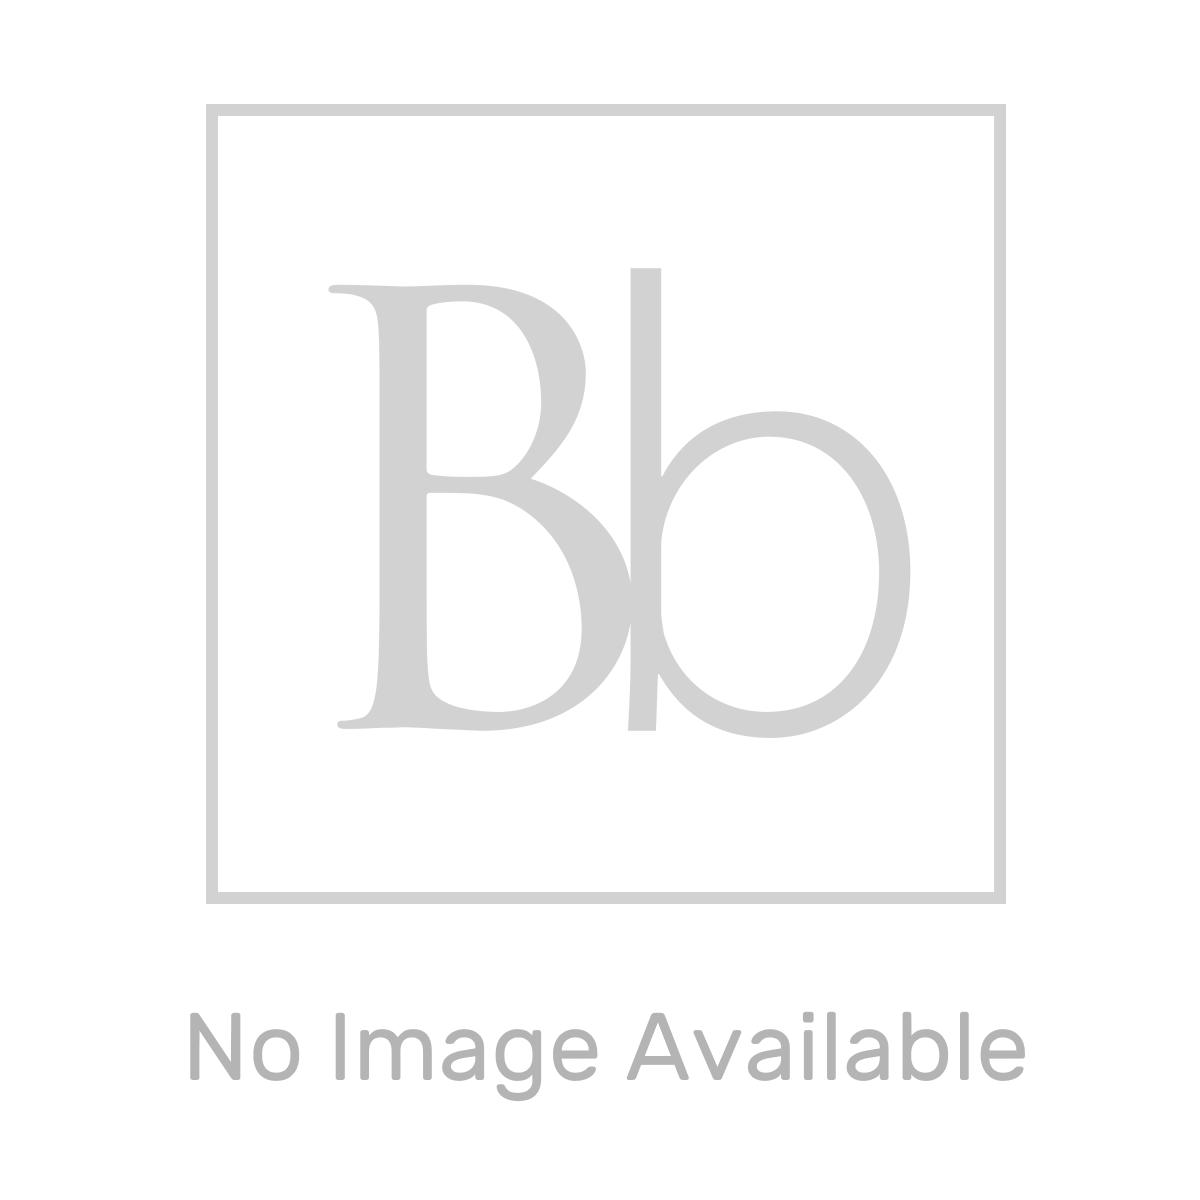 RAK Compact Shower Suite with Pacific Sliding Door Shower Enclosure